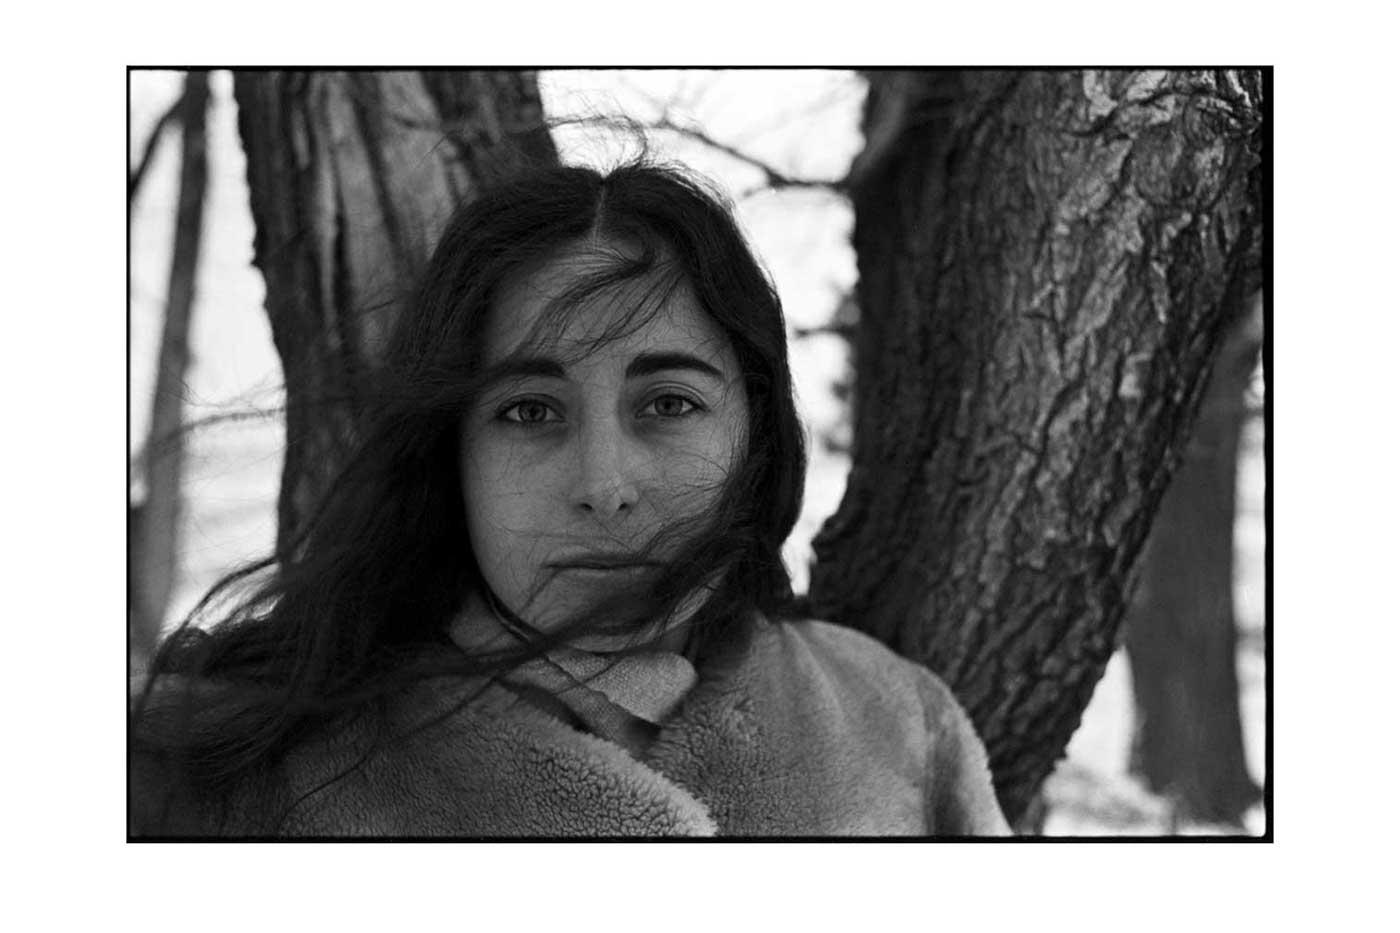 Laura R. 1971